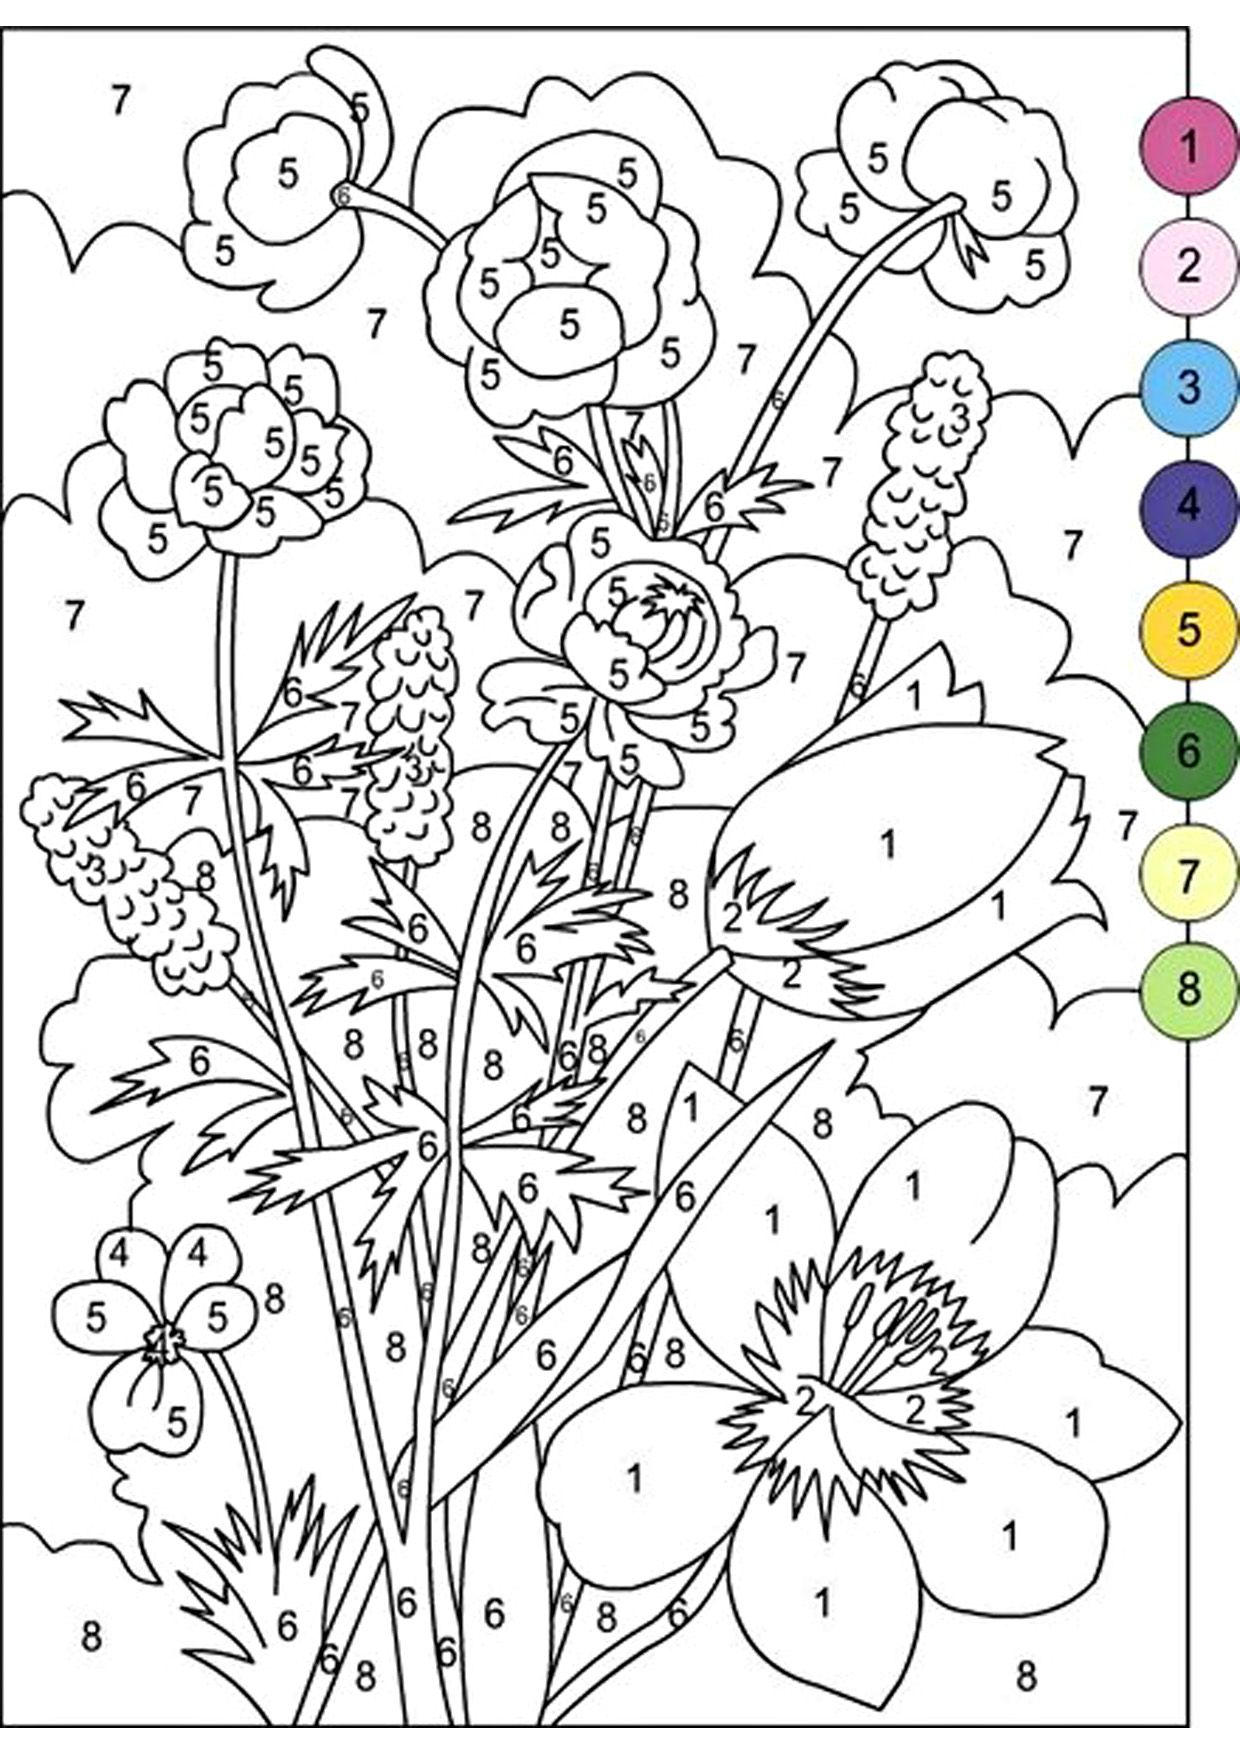 https://s3.eu-central-1.amazonaws.com/img.sovenok.co.uk/flowers ...